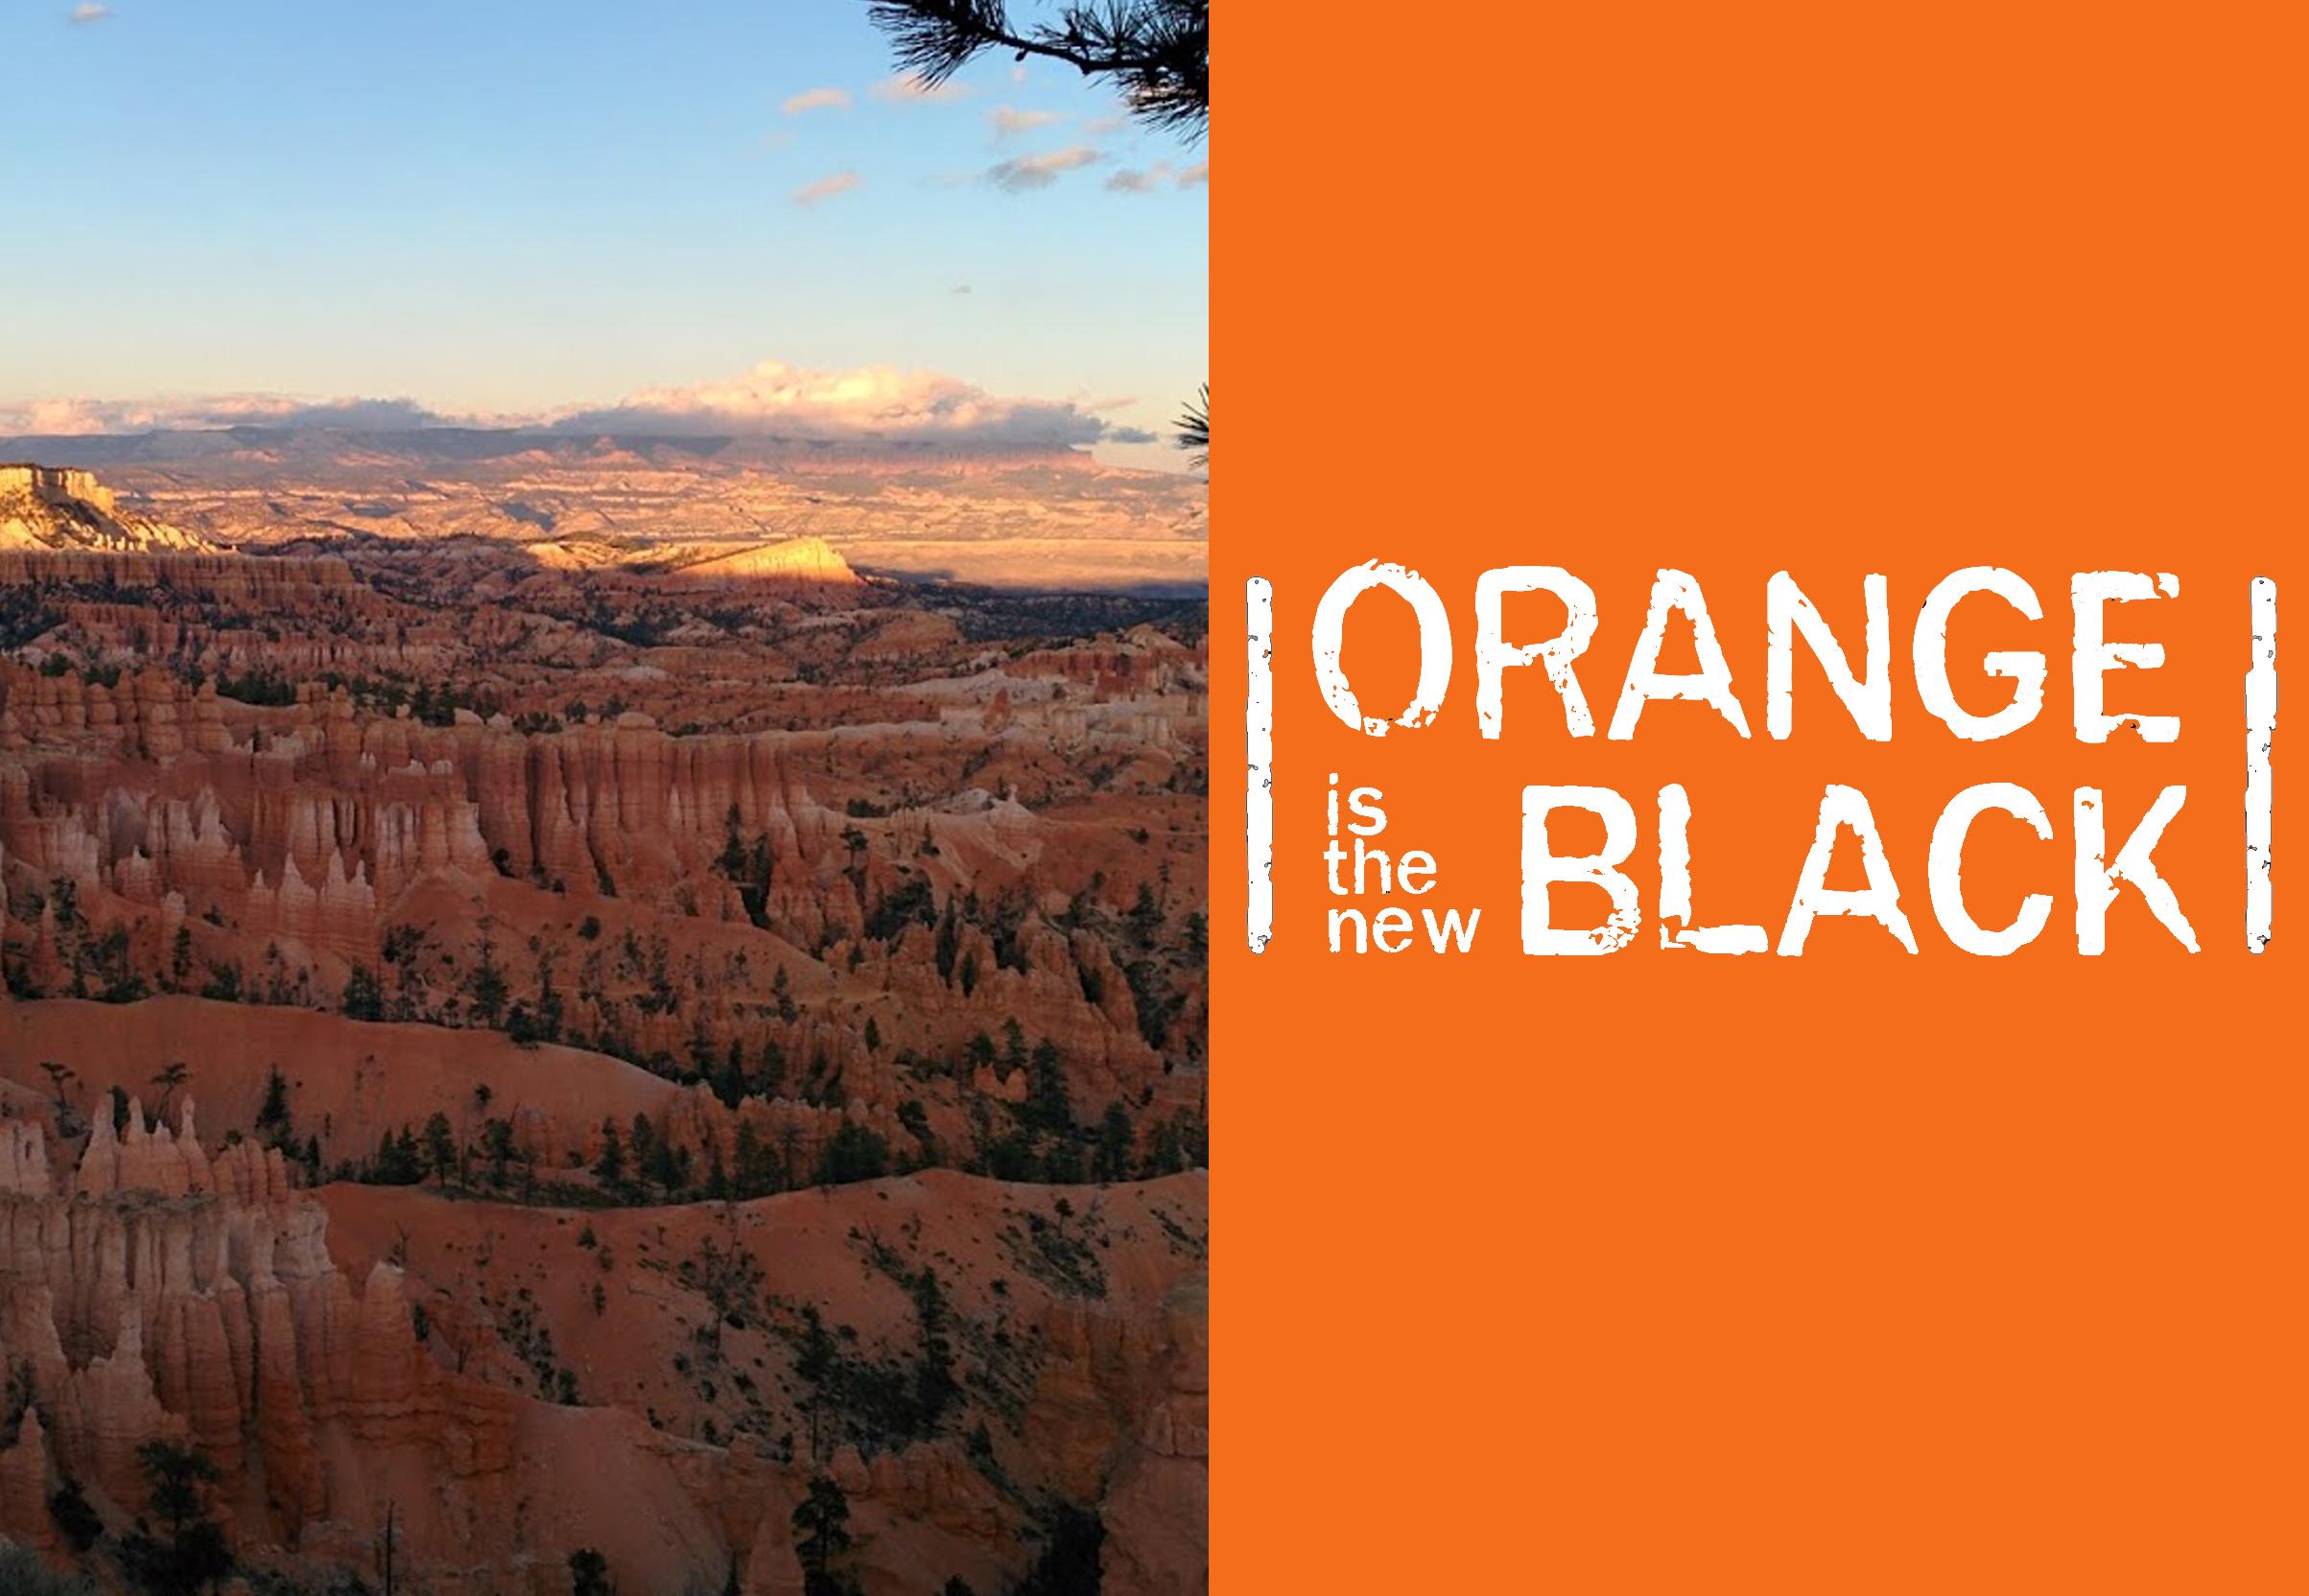 blog-title-orange